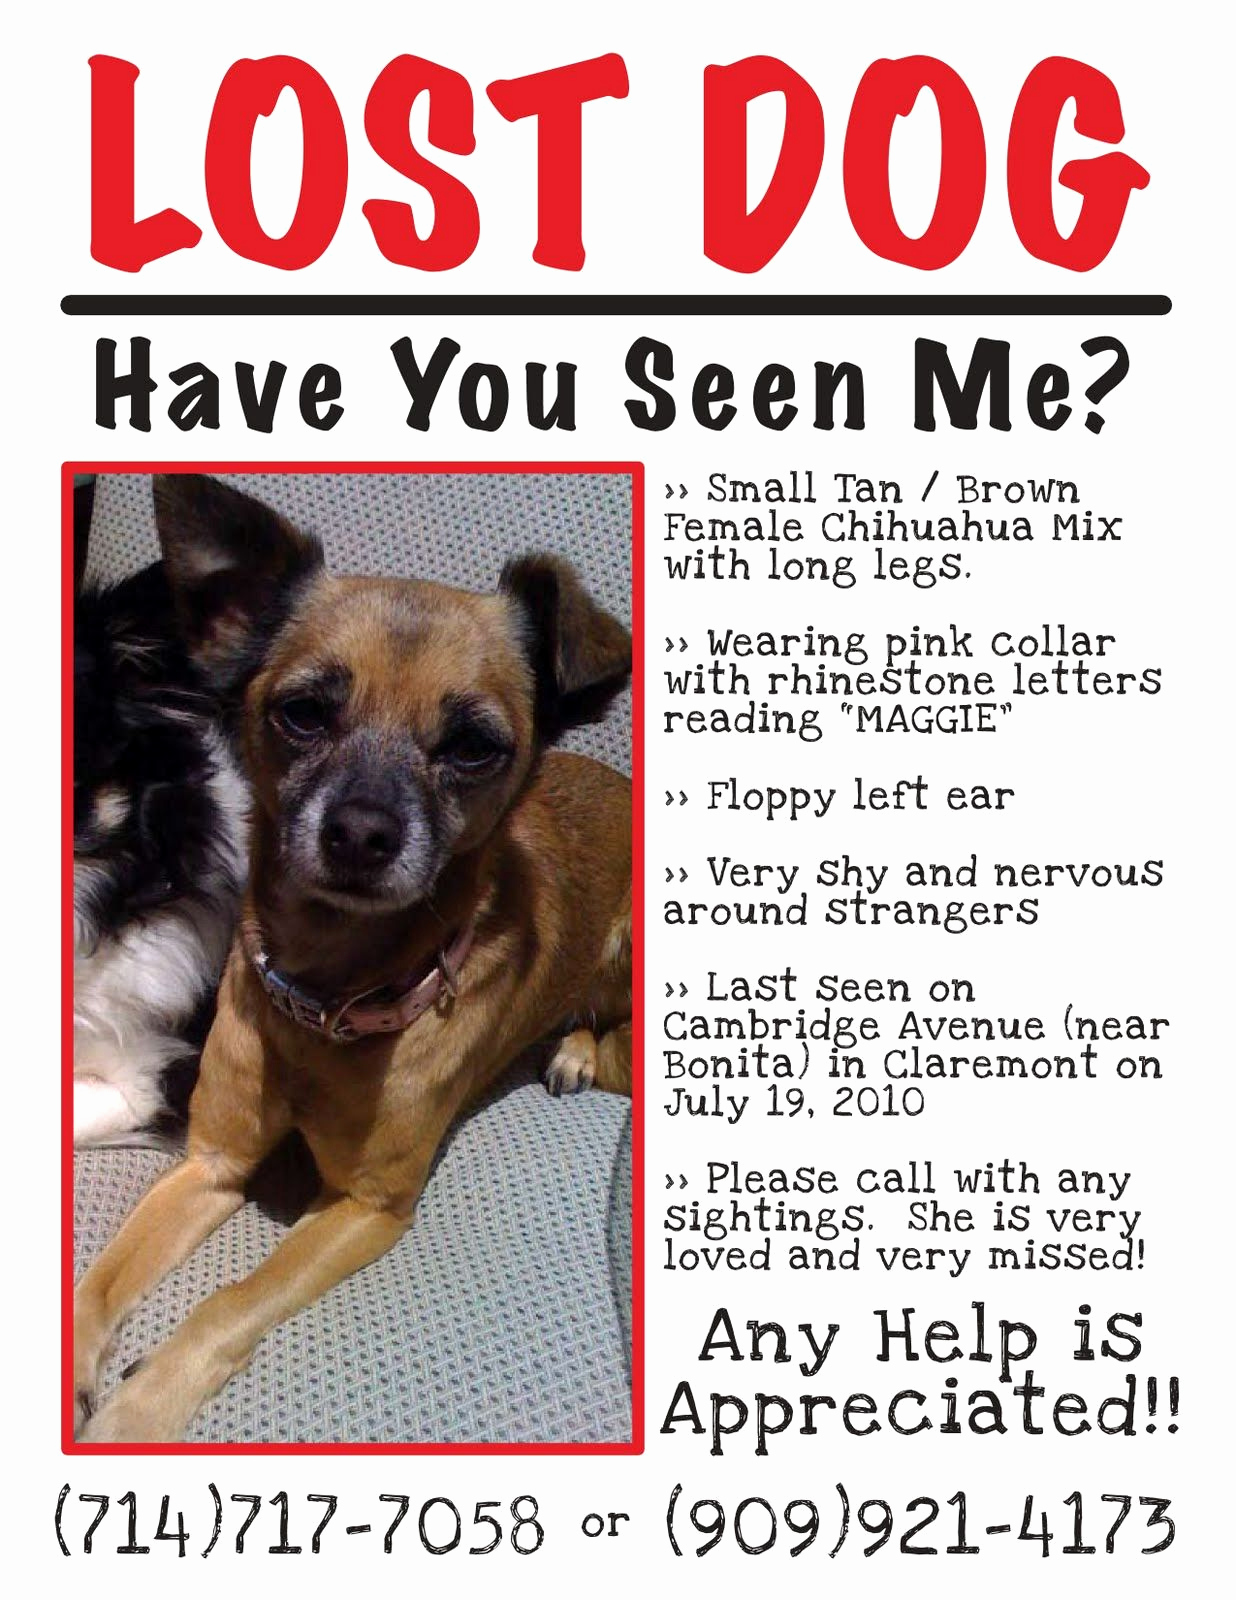 Missing Dog Flyer Template Elegant Flyers for Missing Pets In Texas Lost Dog Flyer